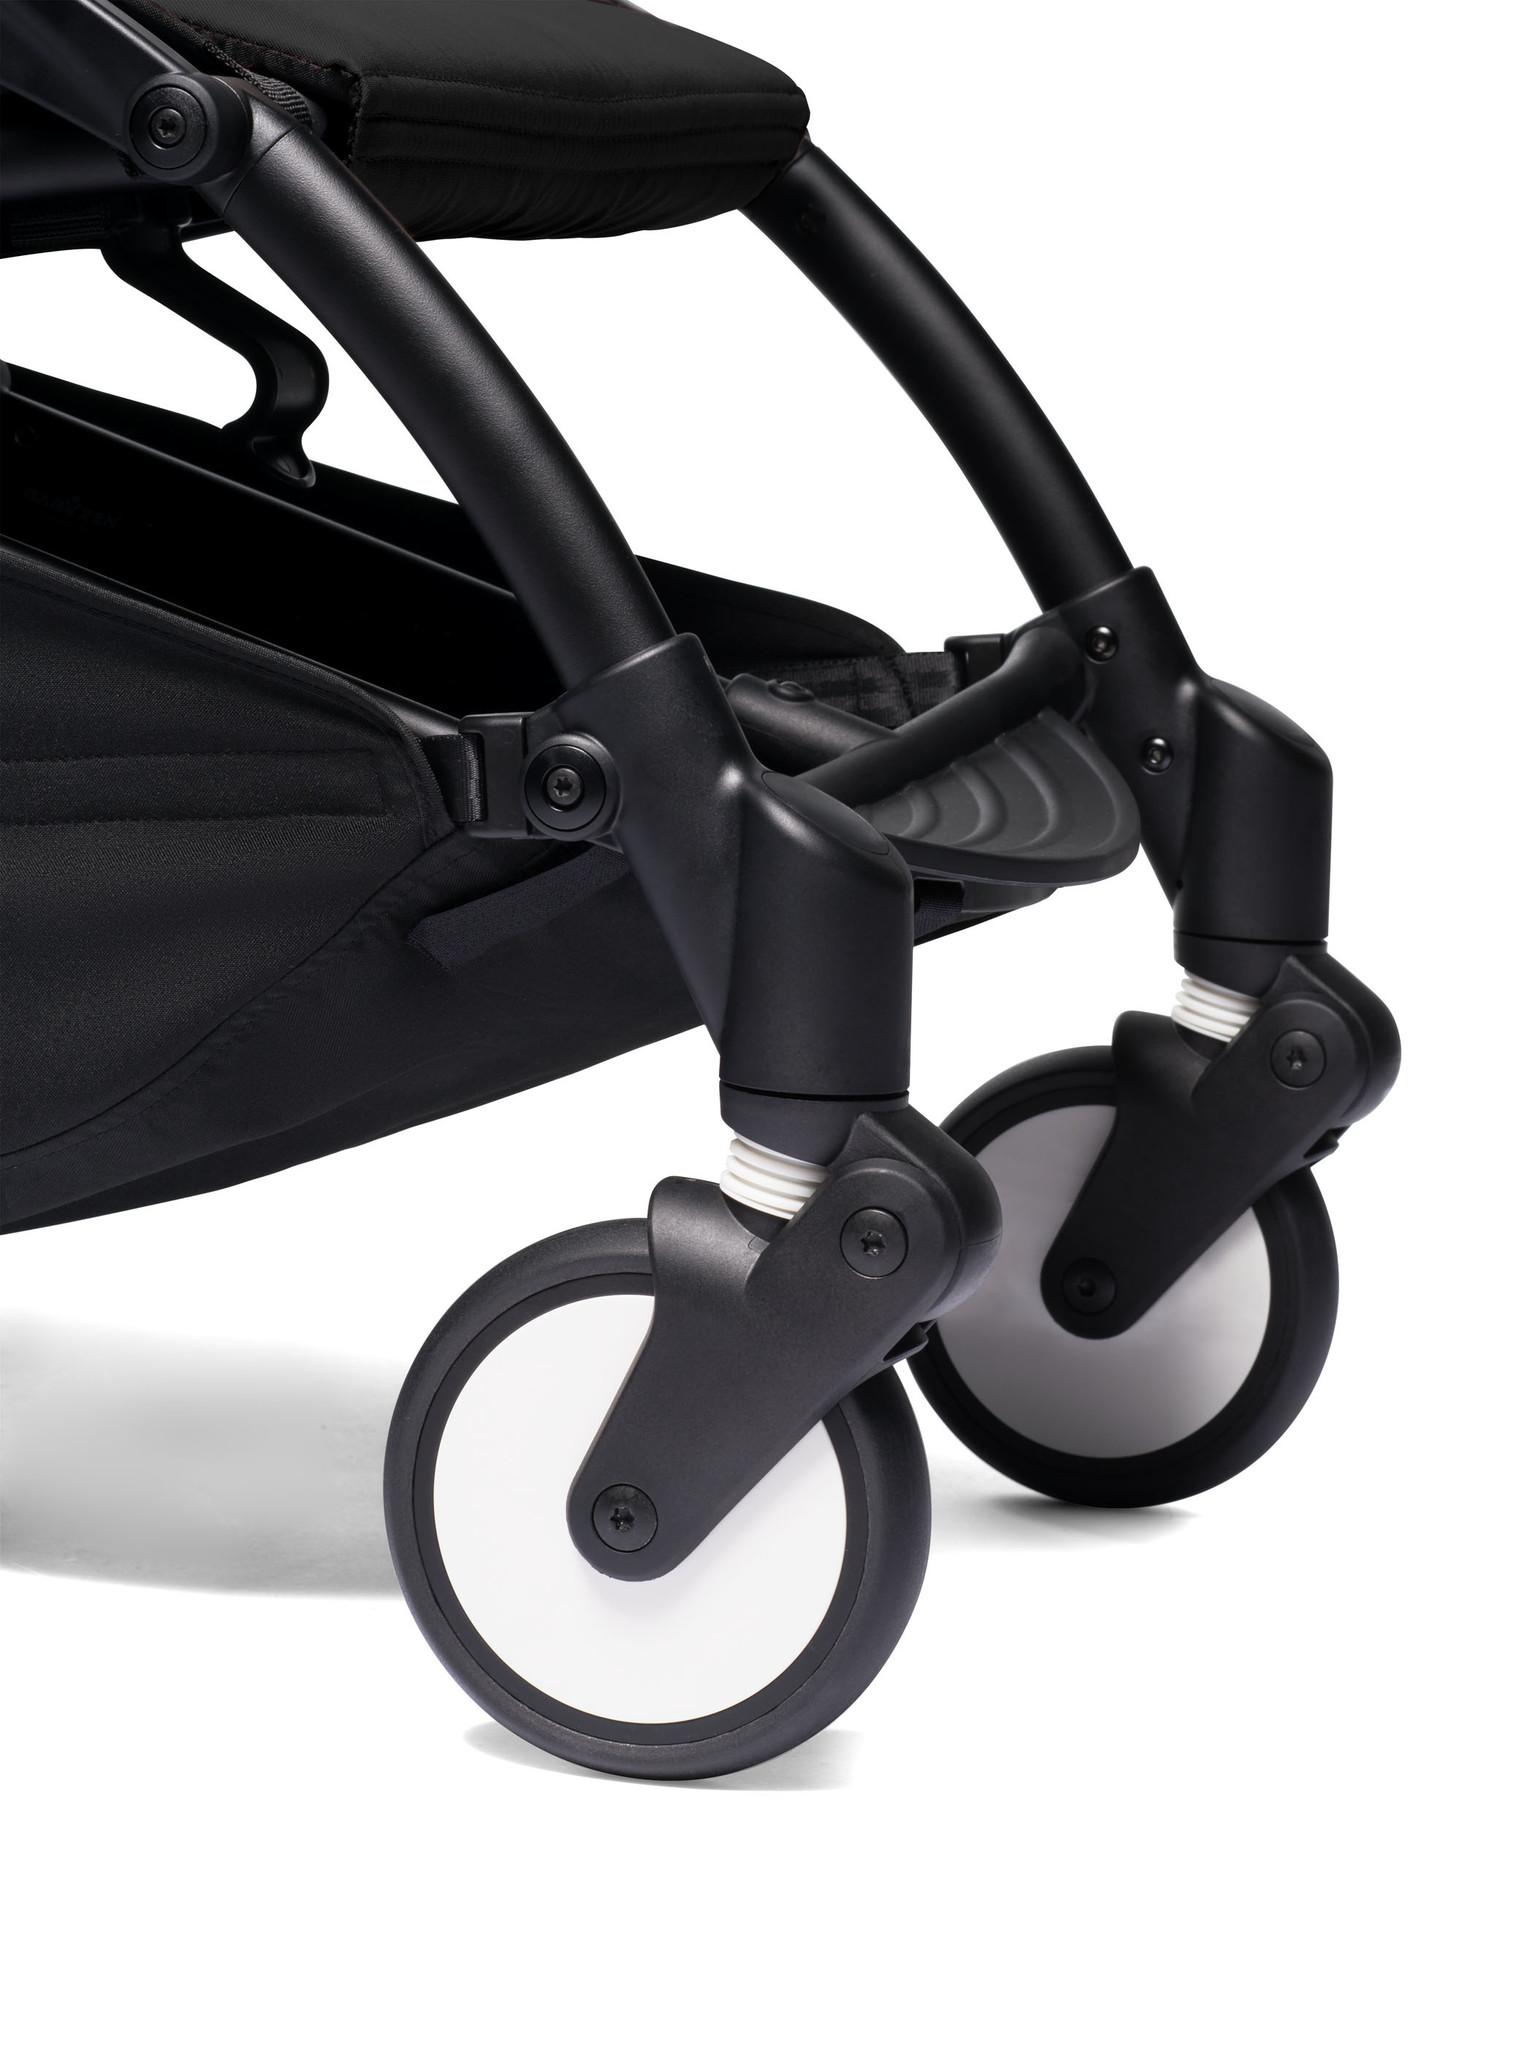 Babyzen Babyzen YOYO² buggy COMPLEET / FULL SET 0+ and 6+ zwart frame wit